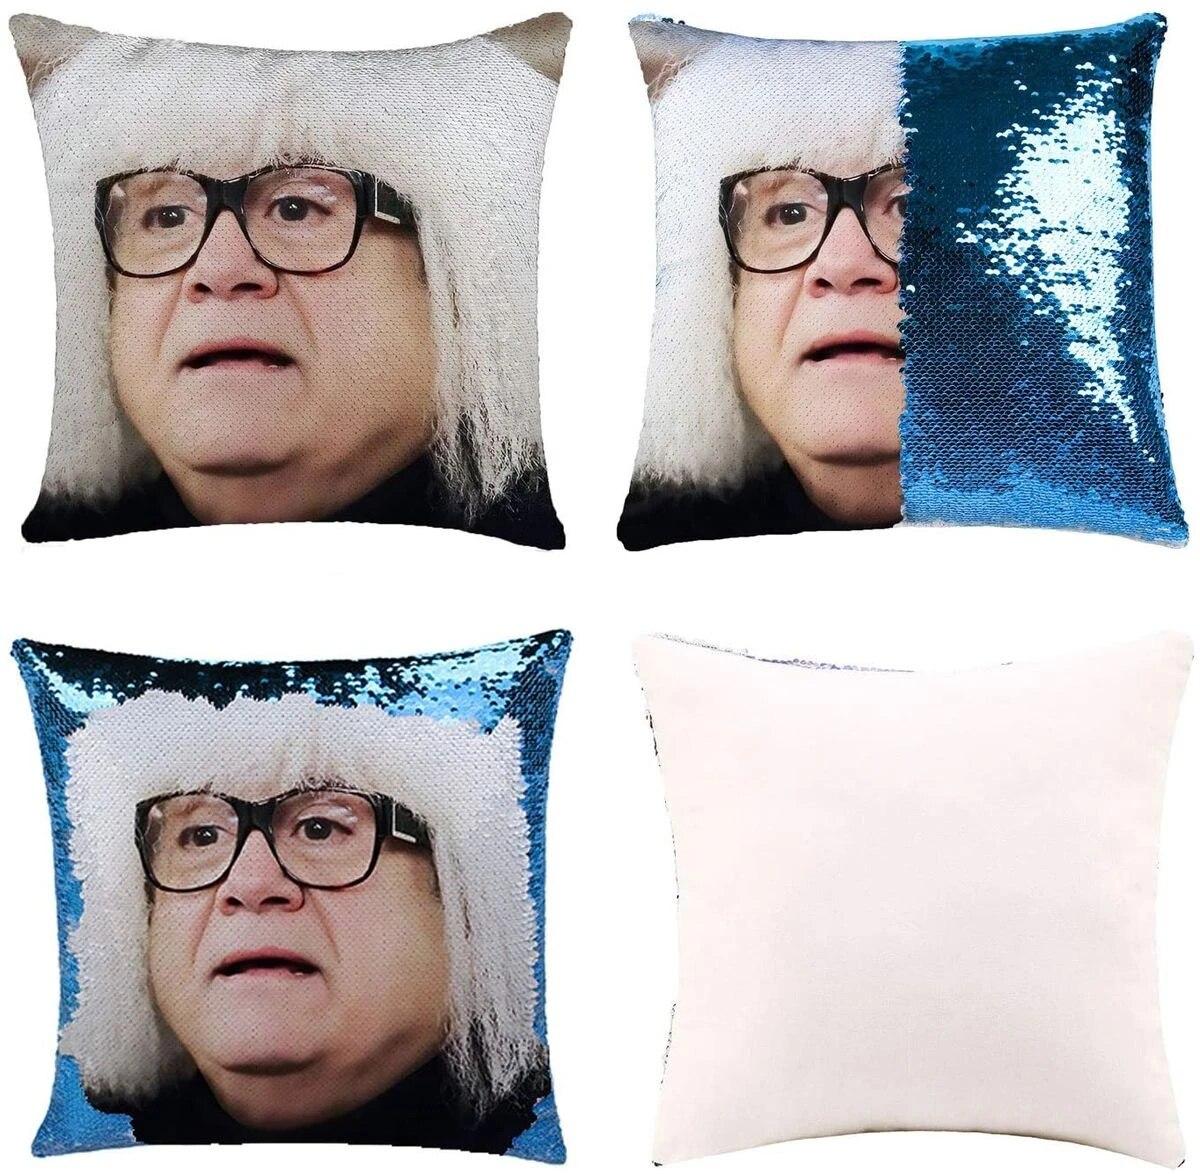 funny diy sequin pillows cover danny devito face magic reversible throw pillow cover decorative change color pillowcase